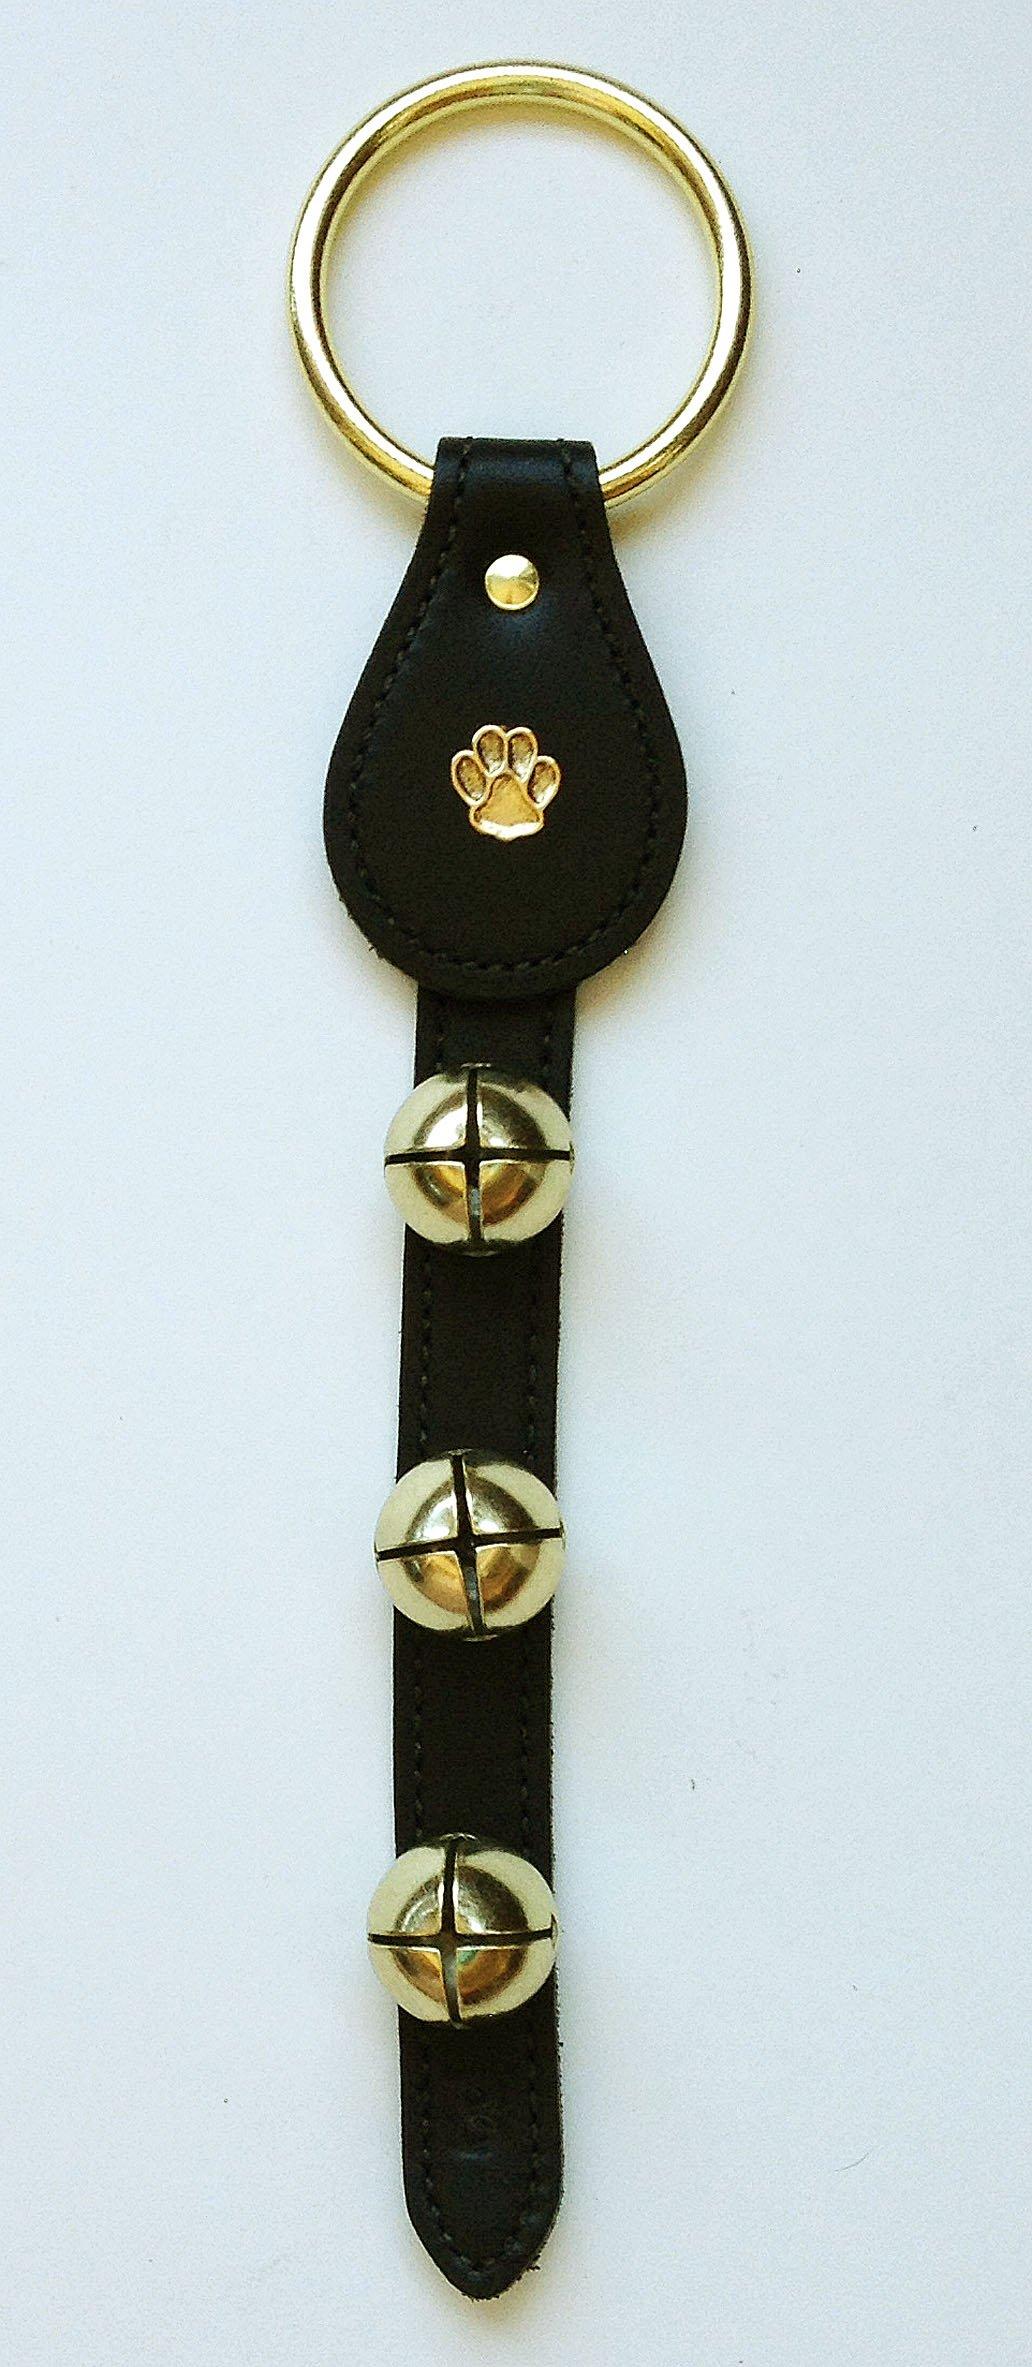 Jingle Bells - Leather Bell Strap w/ Dog Paw Print Charm & Brass Plated Bells - Black - Dog Training Bells - Sleigh Bells